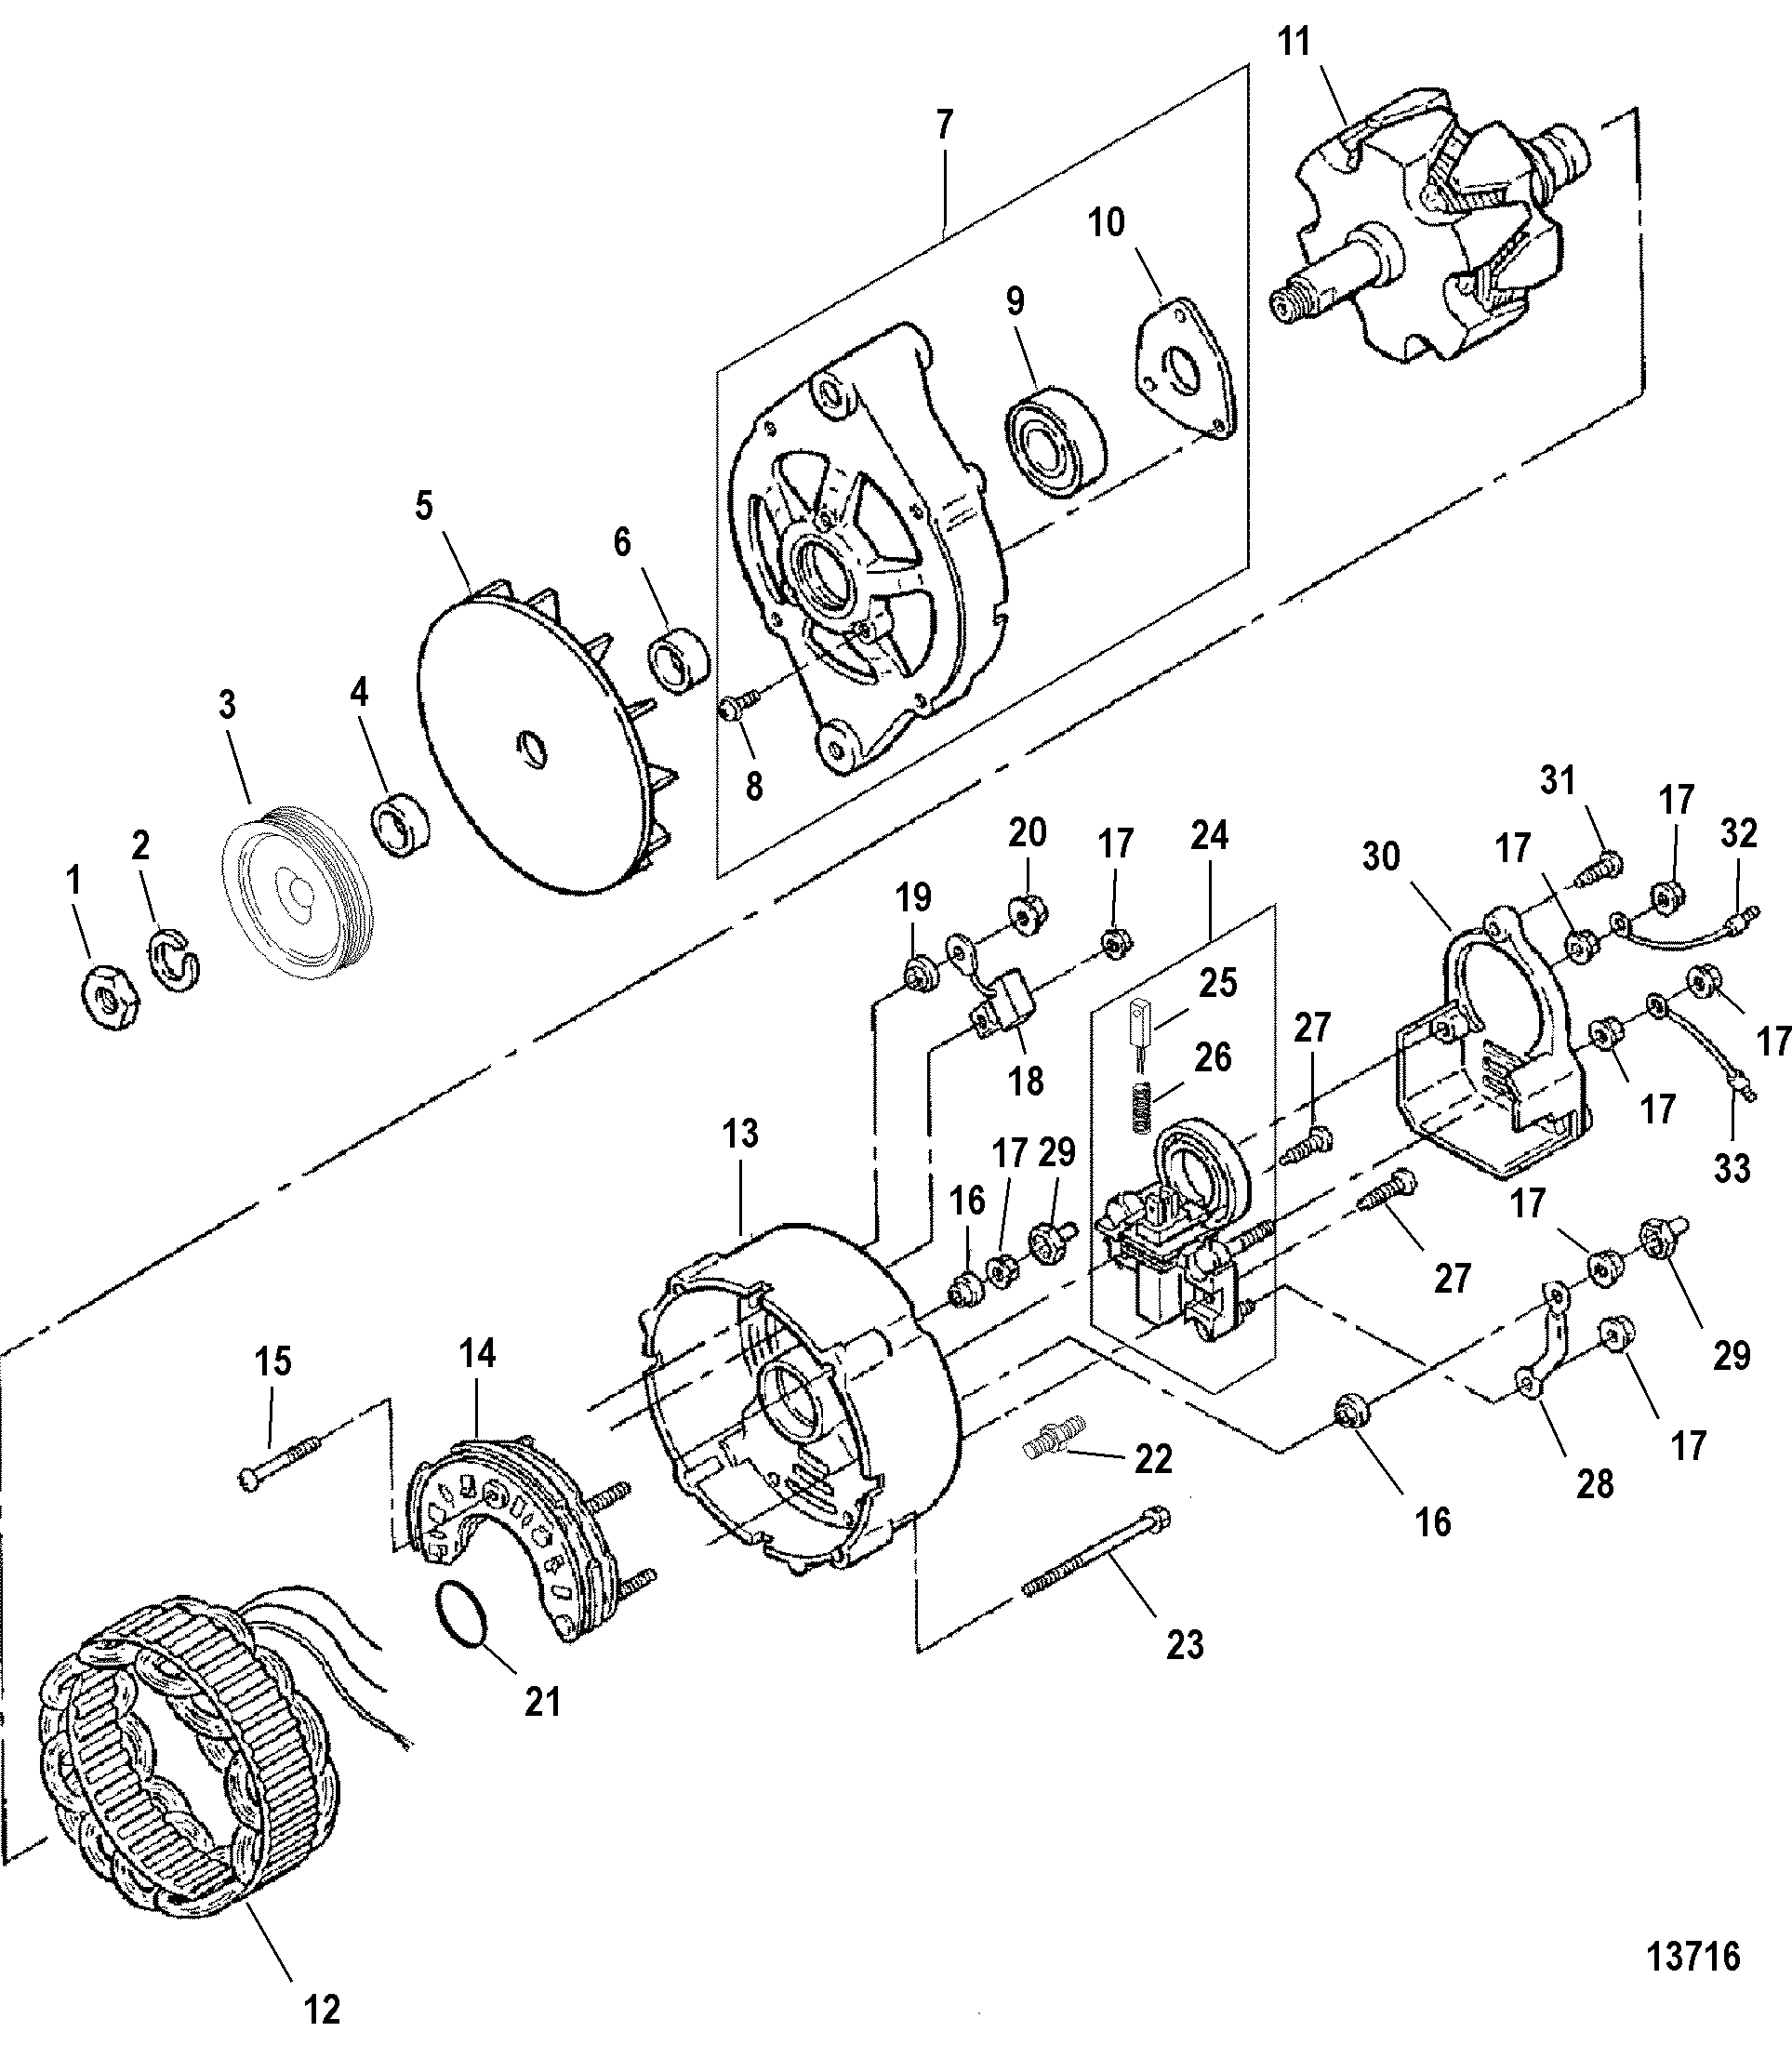 fancy mando marine alternator festooning electrical diagram ideas piotomar info Motorola Marine Alternator Wiring Diagram Marine Diesel Alternator Wiring Diagram